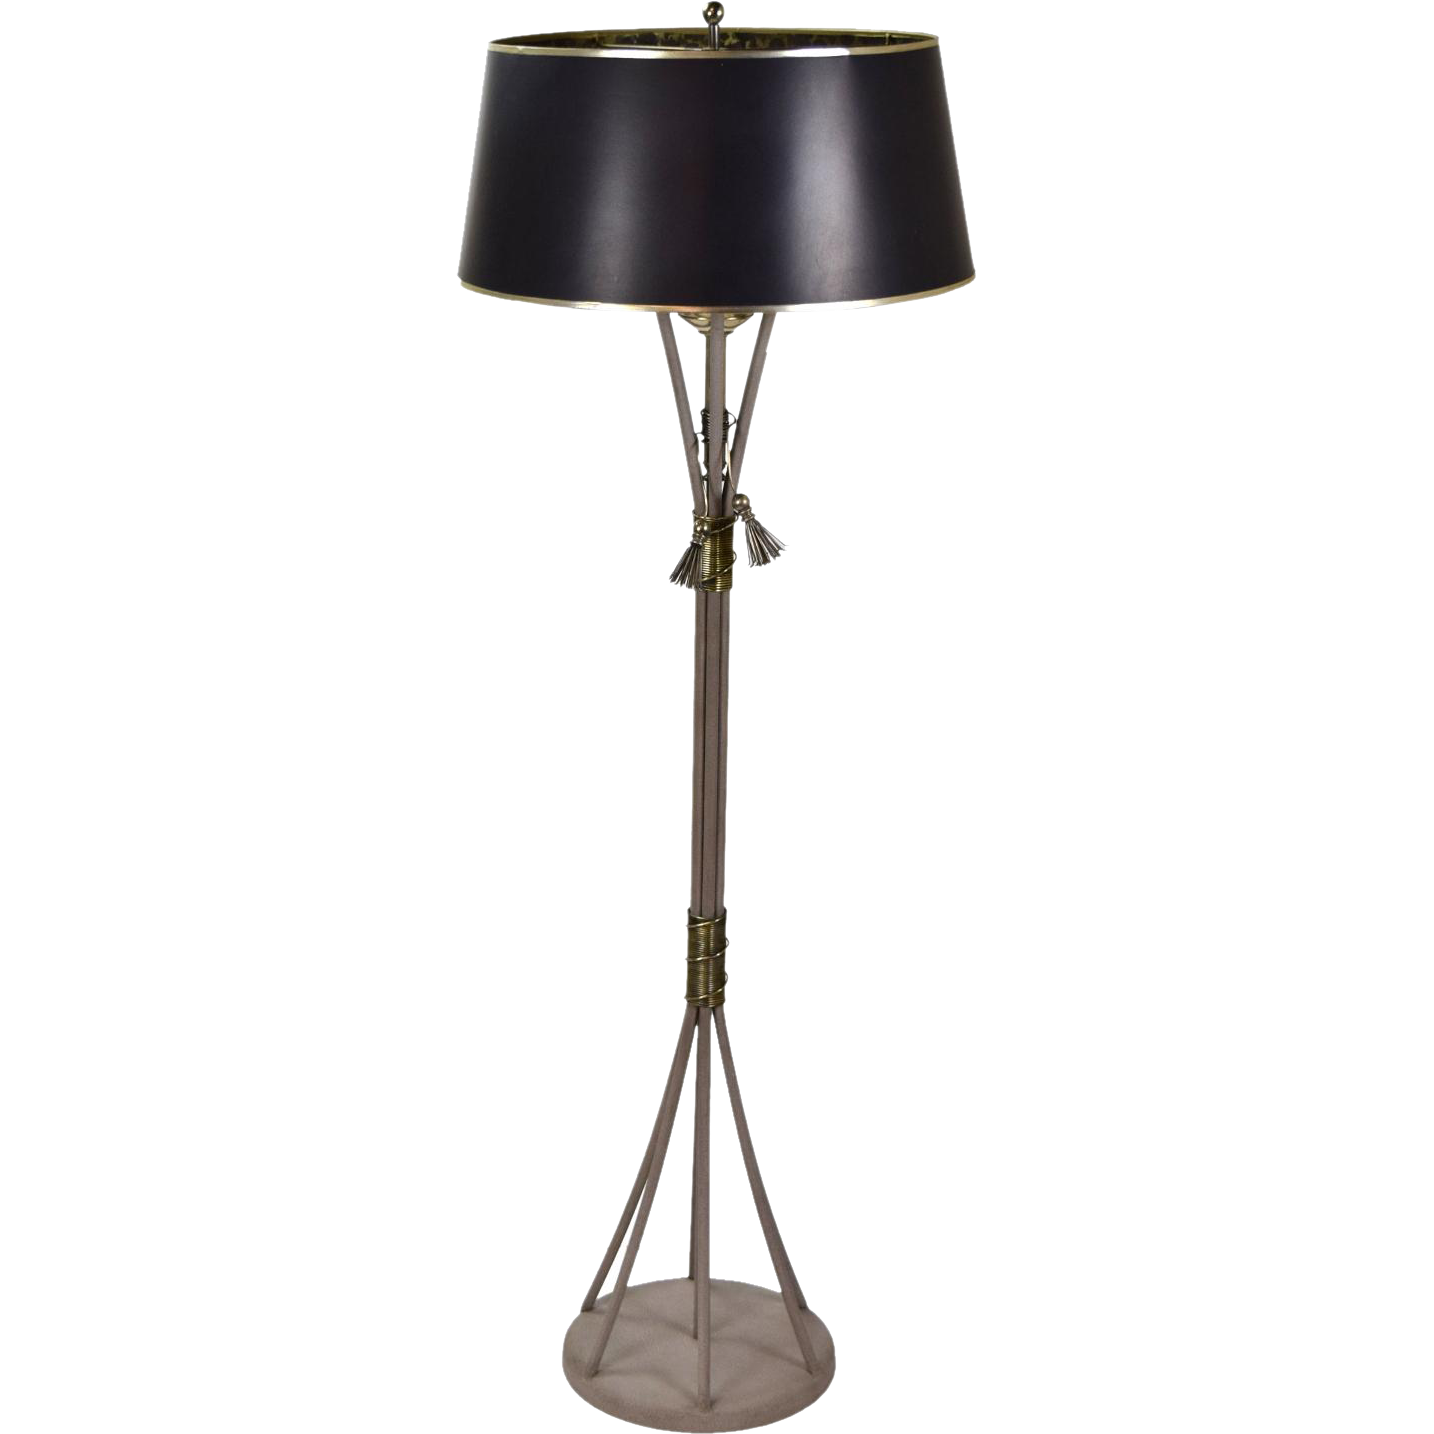 Vintage Hart Associates Floor Lamp Sheaf of Steel Rods with Nickel Finish Orb